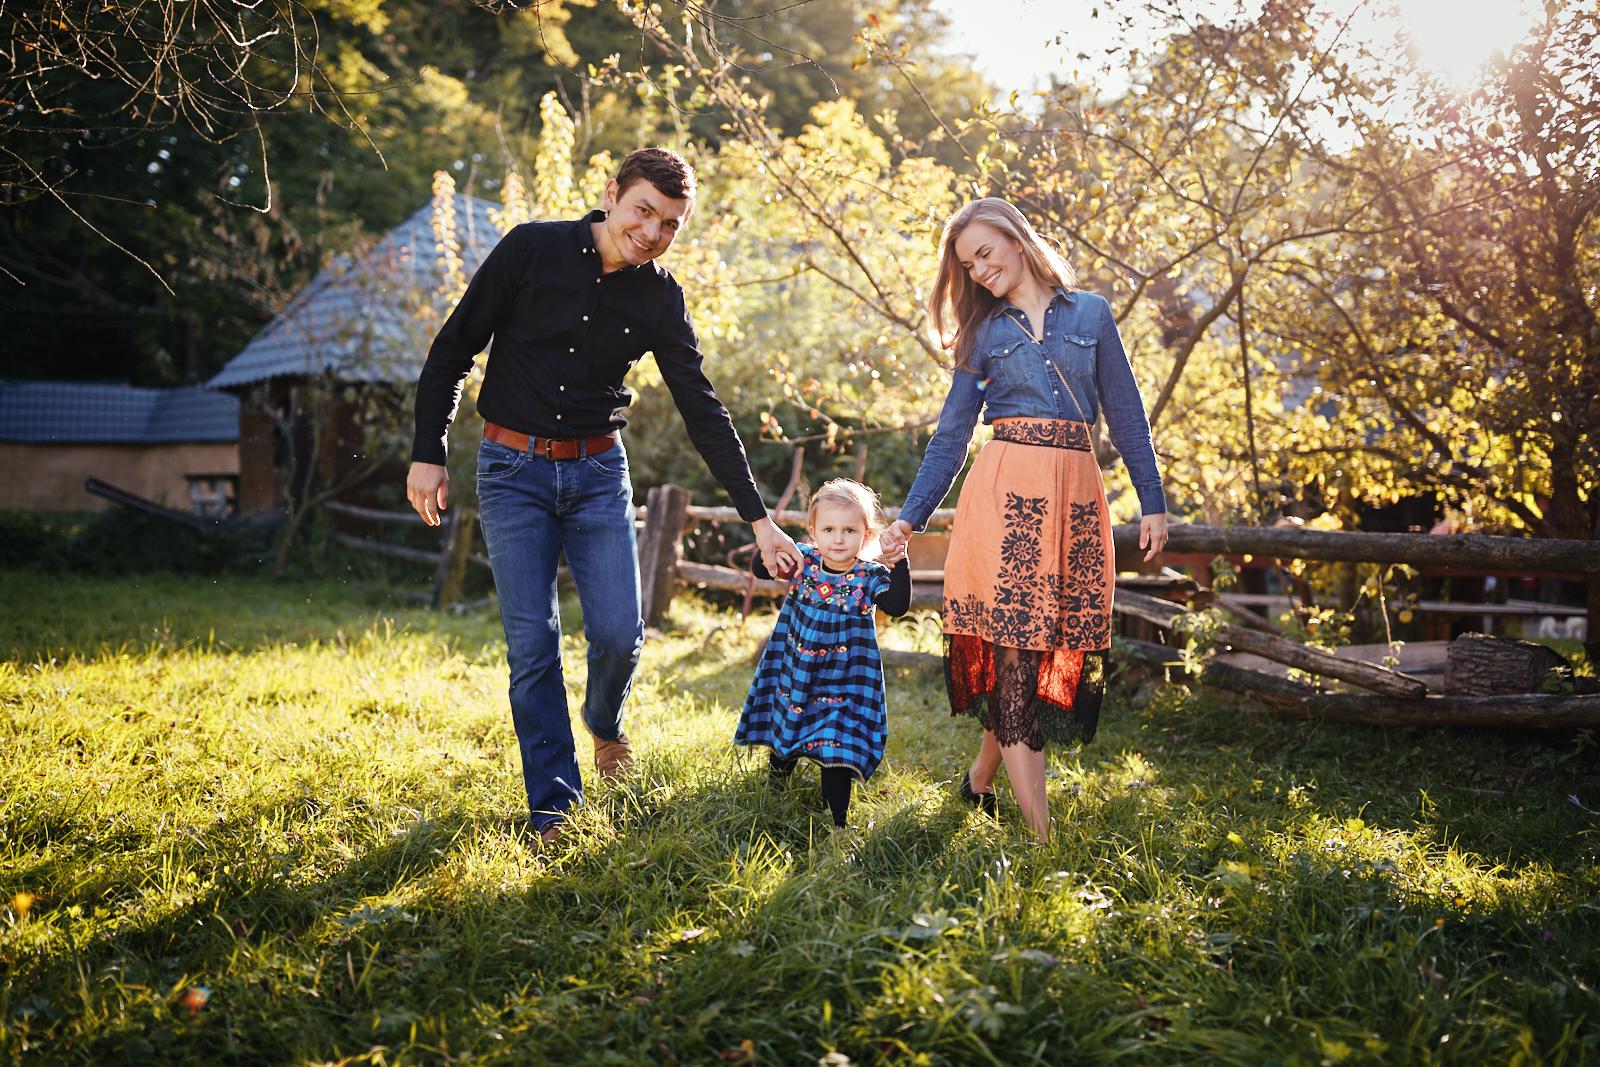 dusan plichta powerlogy rodina sila novy rok motivacia